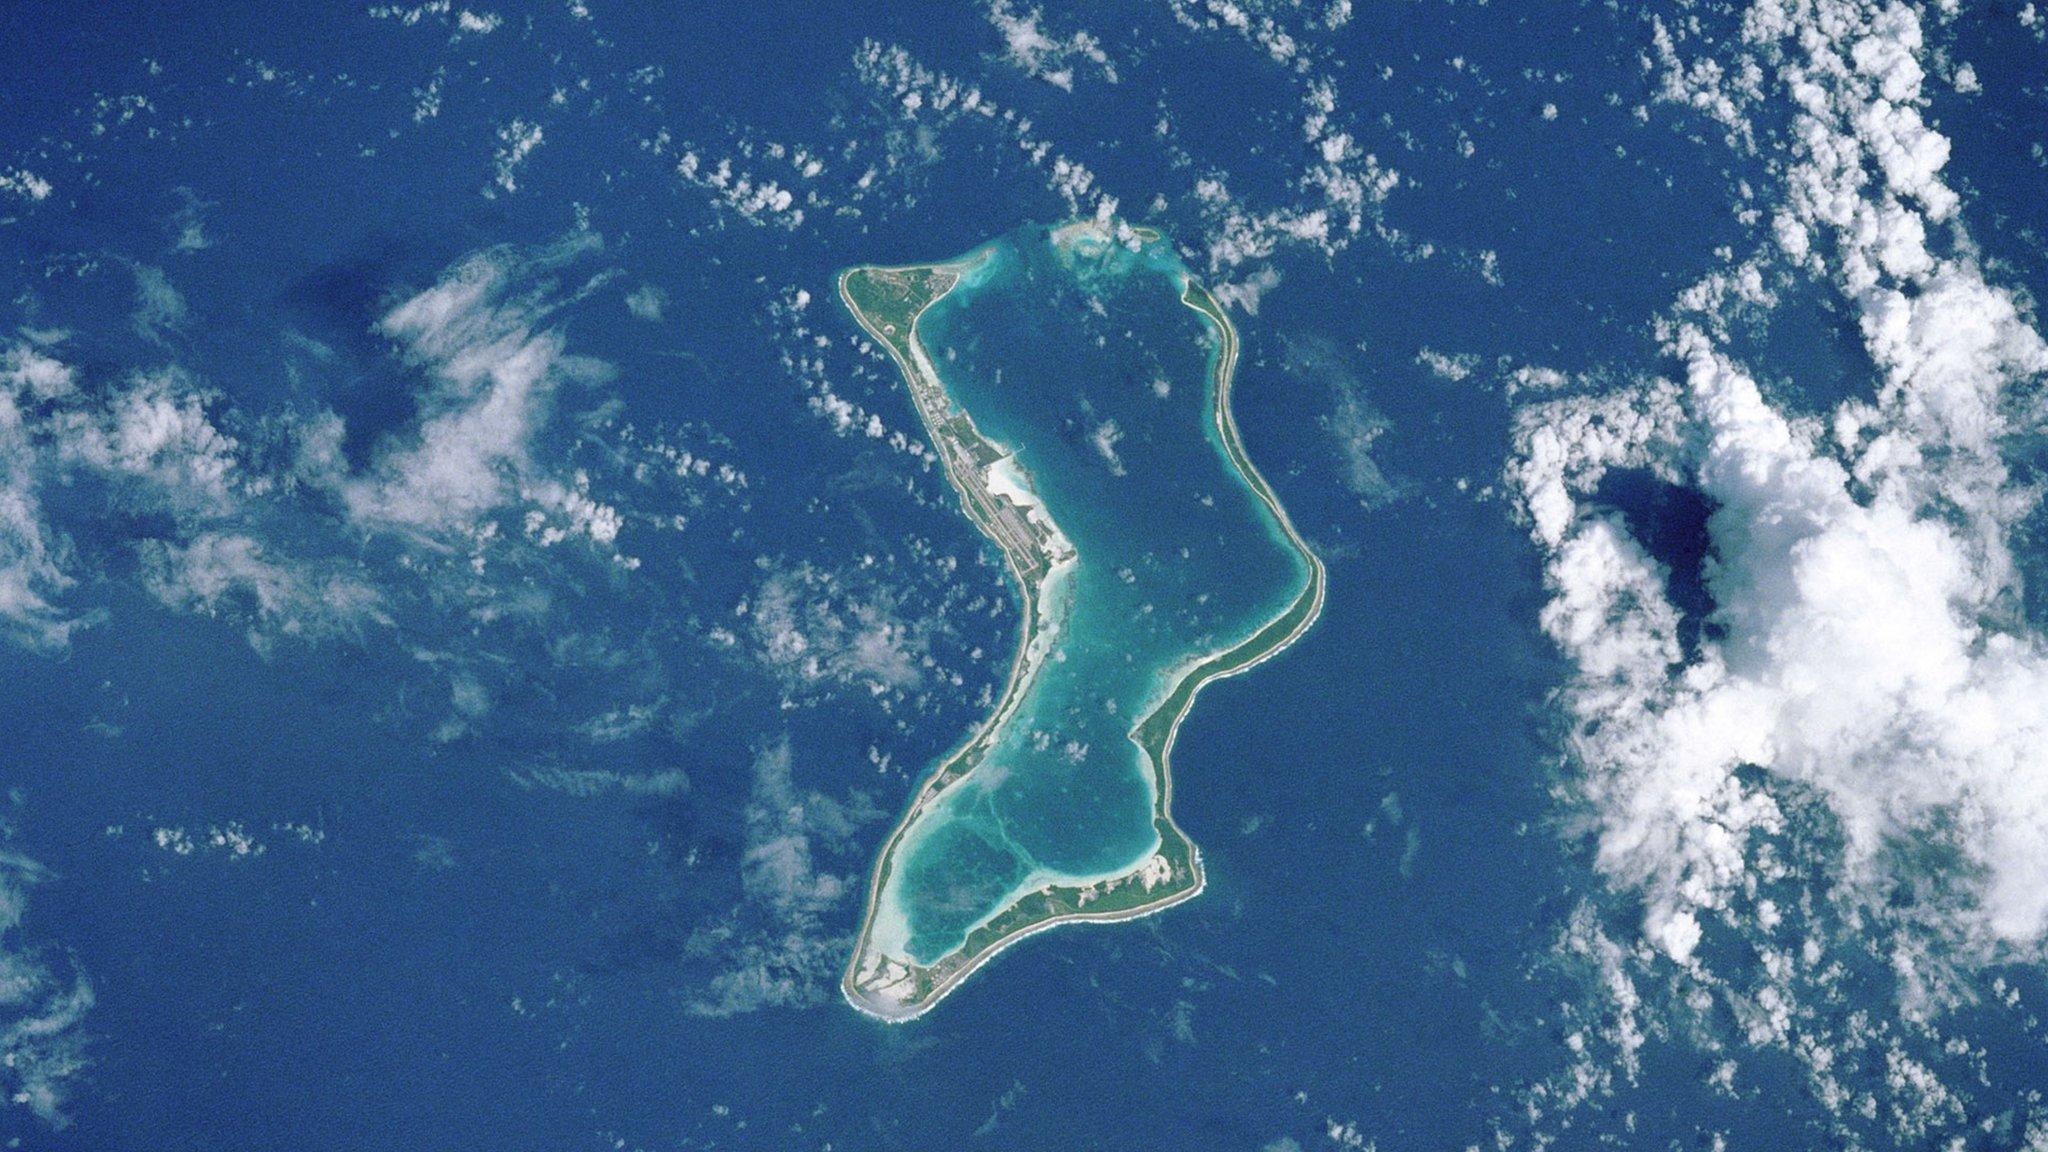 Chagos islanders cannot return home, says Supreme Court